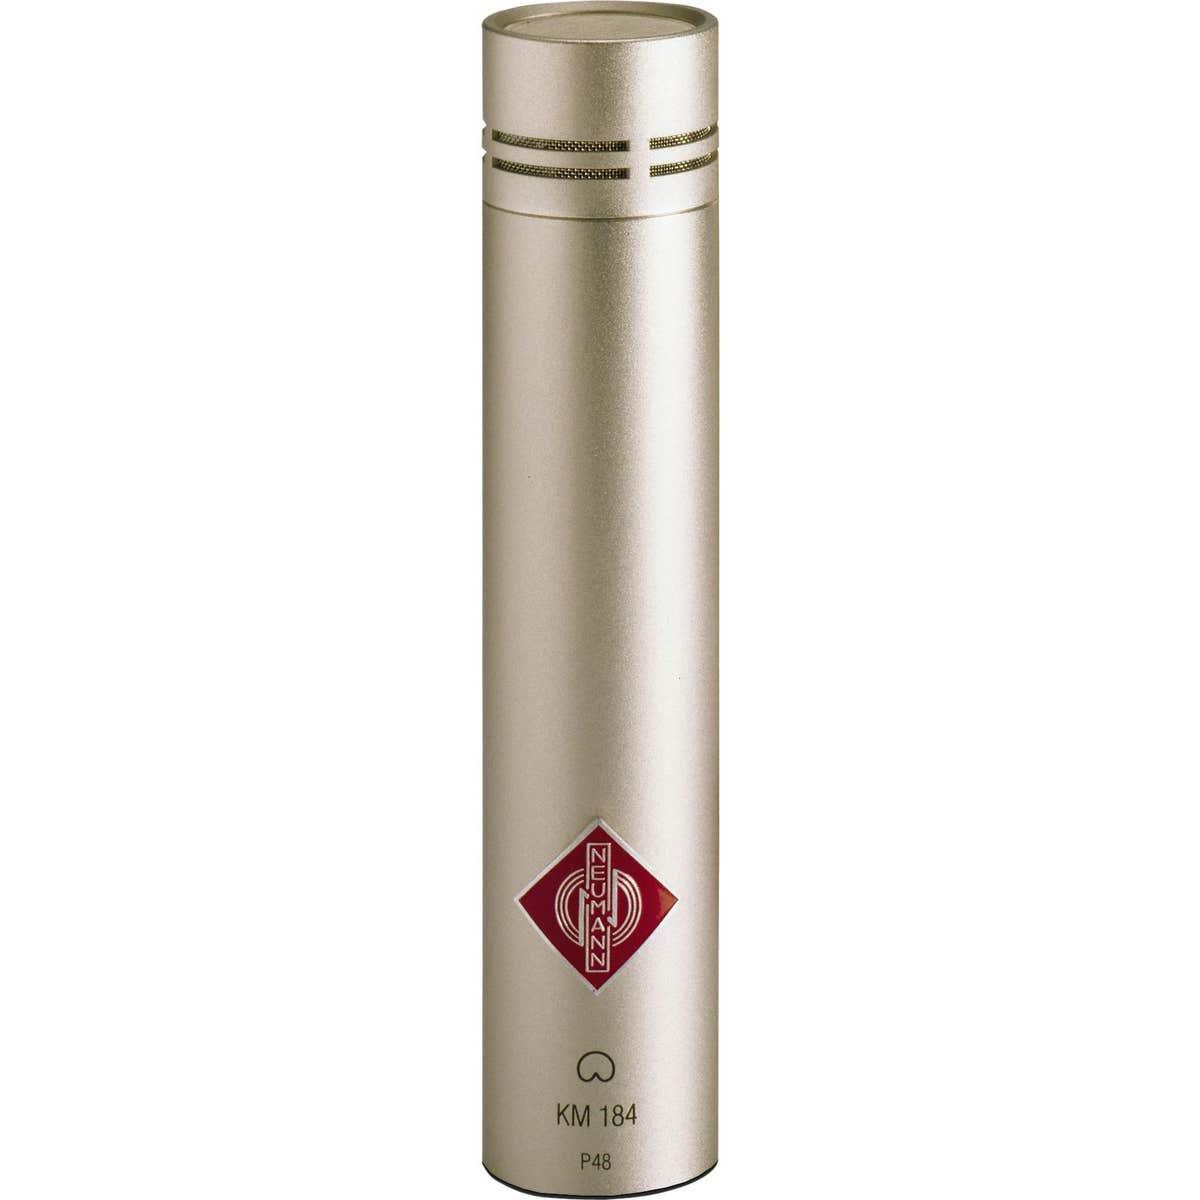 Neumann KM184 Small Diaphragm Condenser Microphone